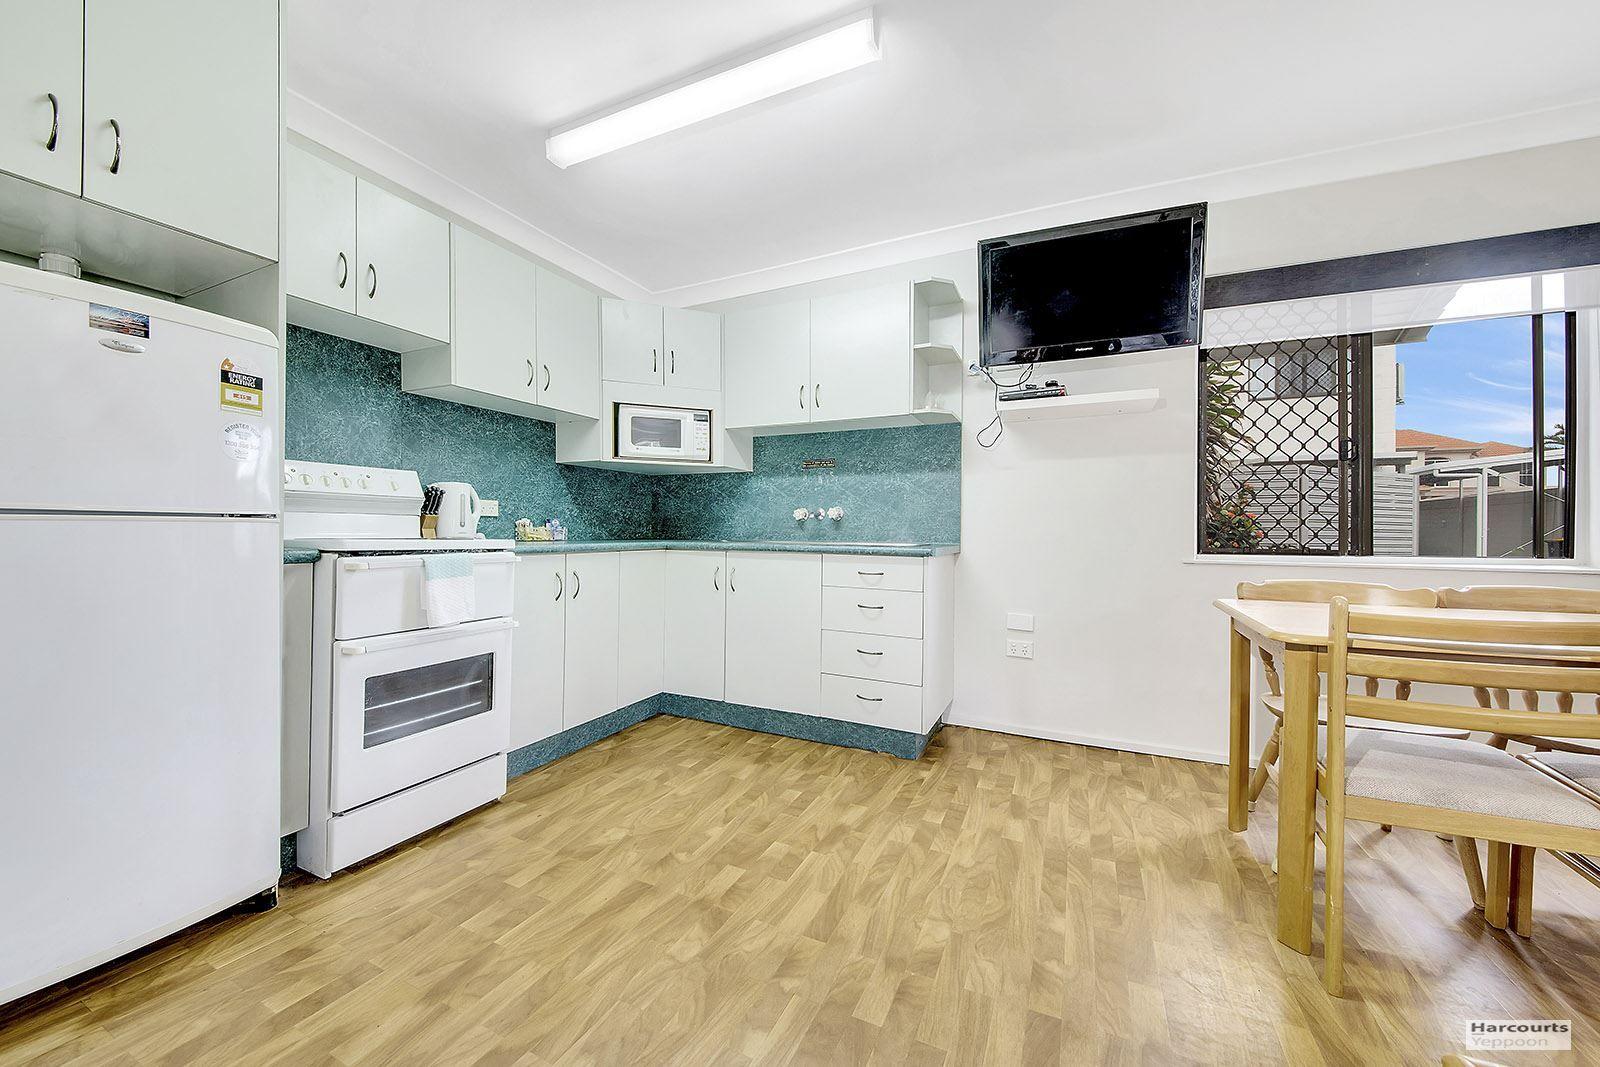 1/5-7 Todd Avenue - Driftwood Motel, Yeppoon QLD 4703, Image 1